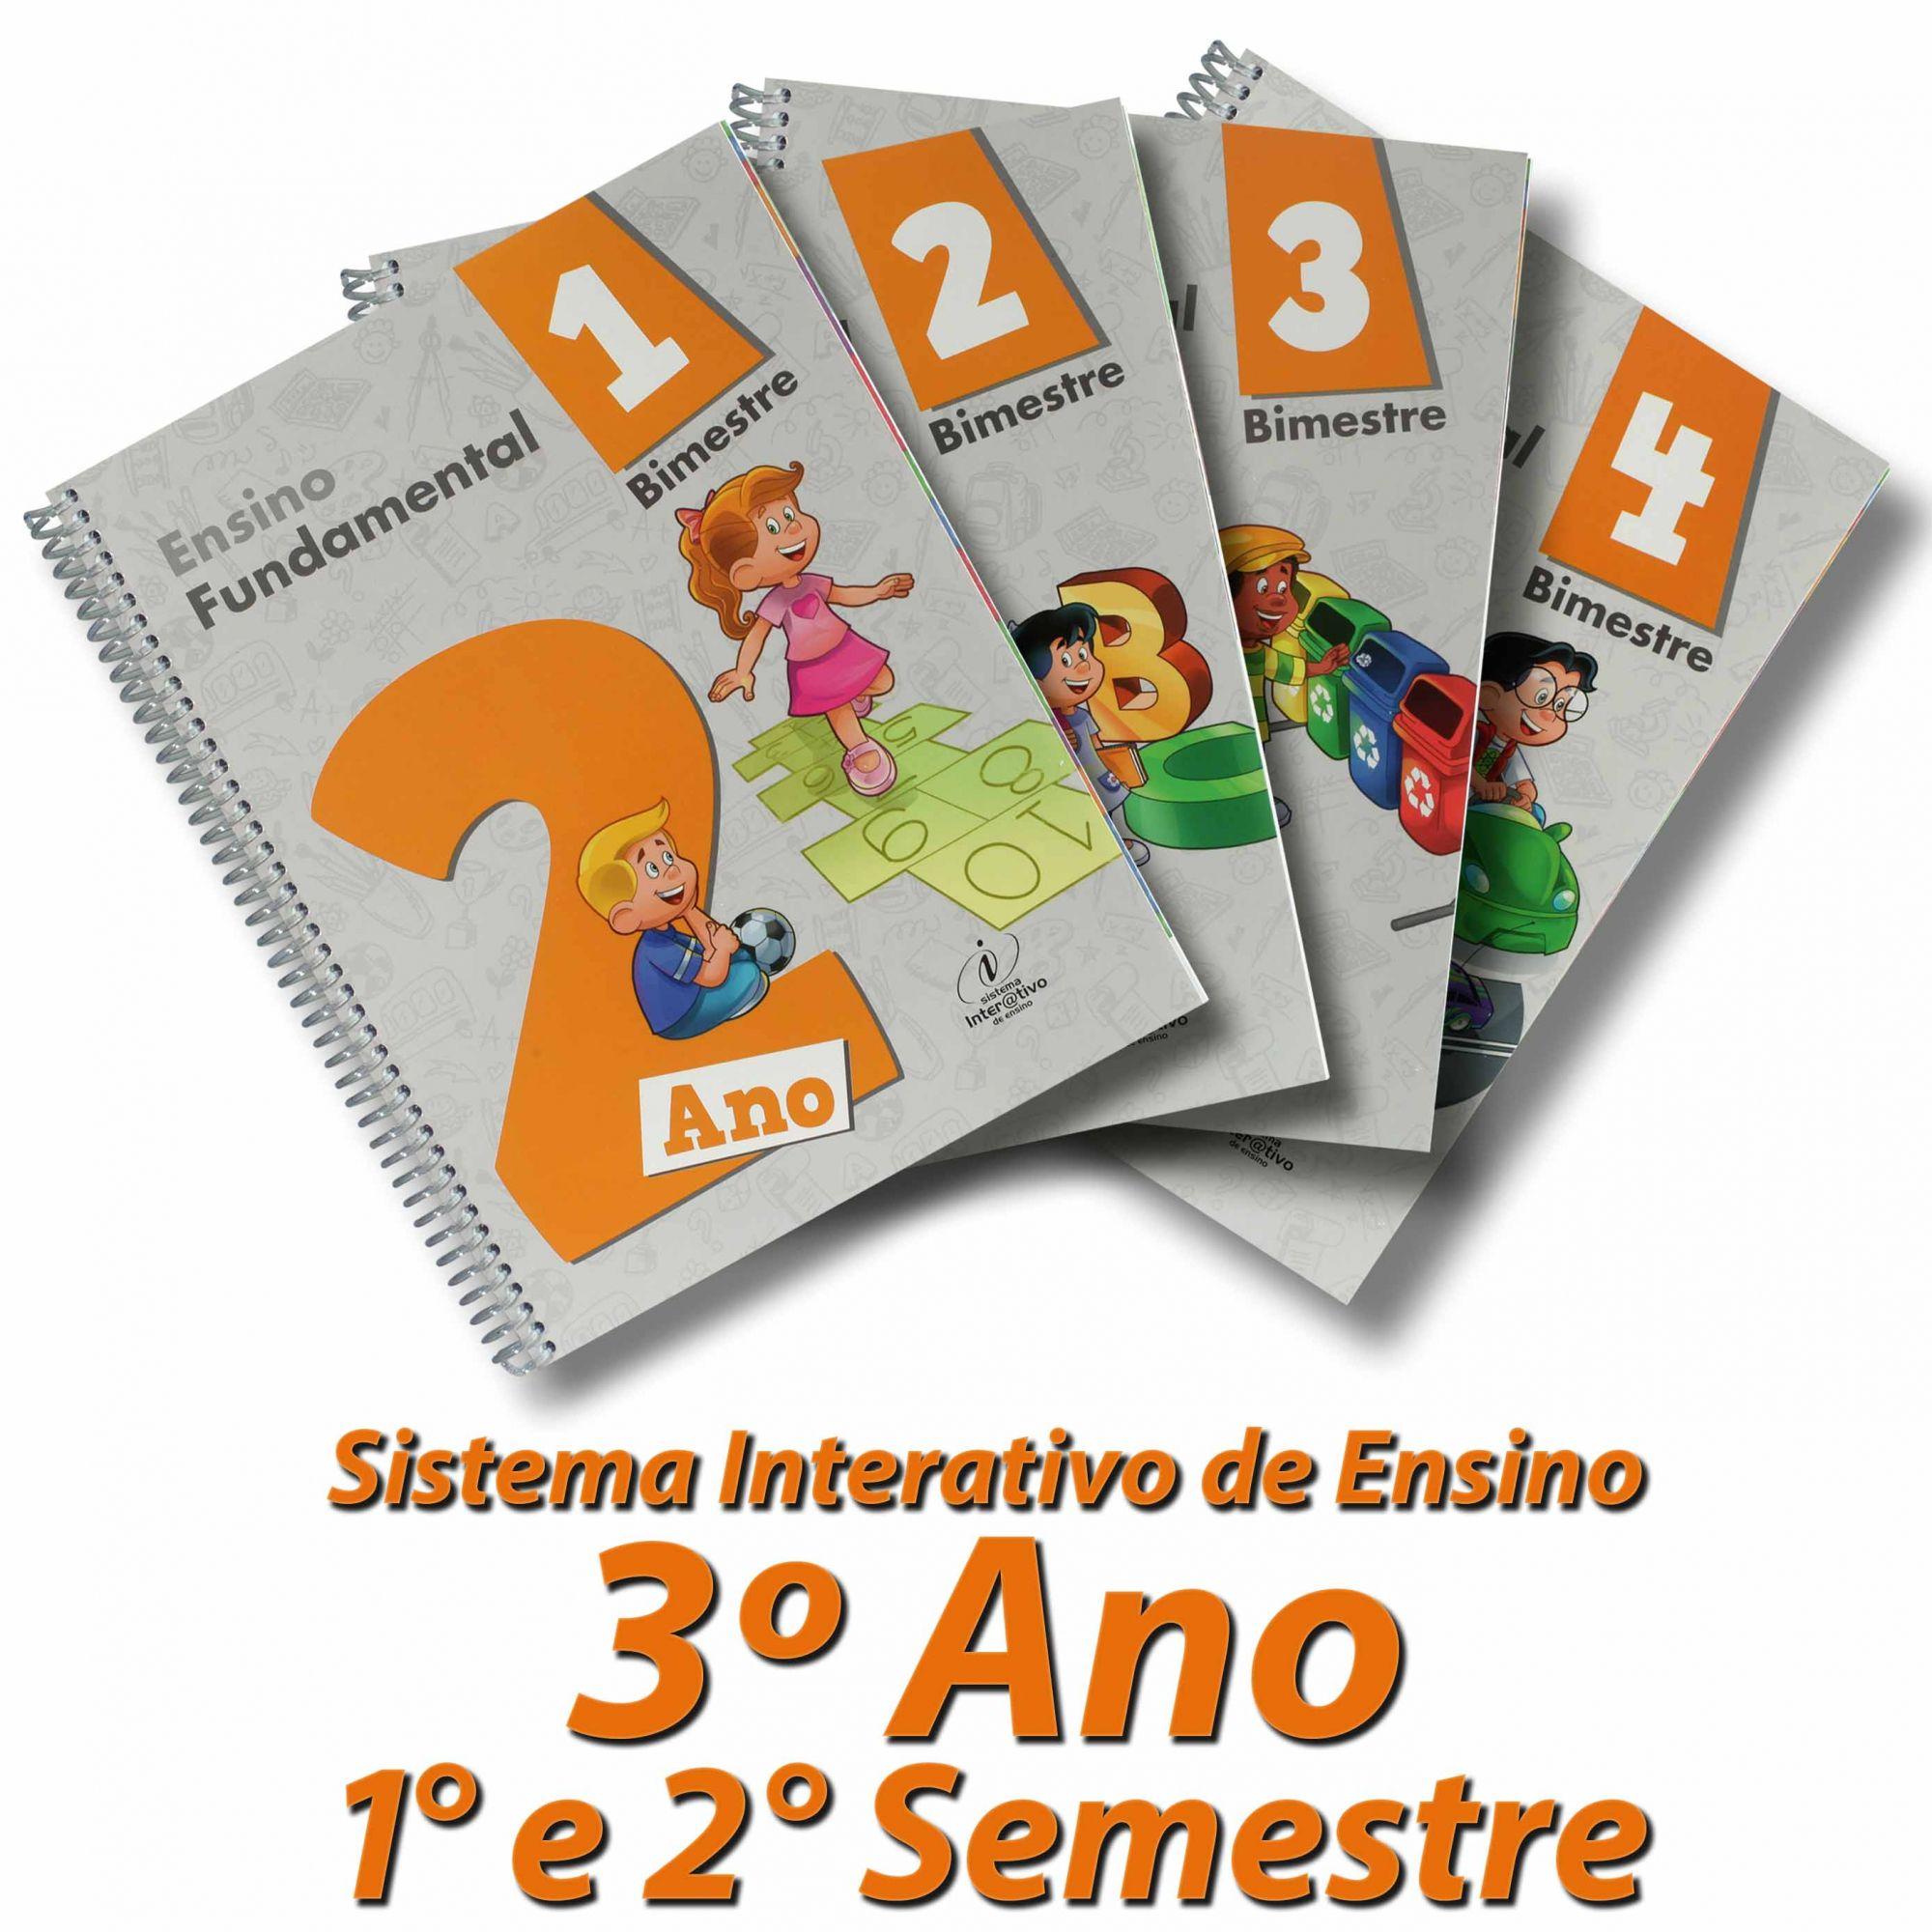 Sistema Interativo de Ensino 2º Ano |1º Semestre e 2º Semestre